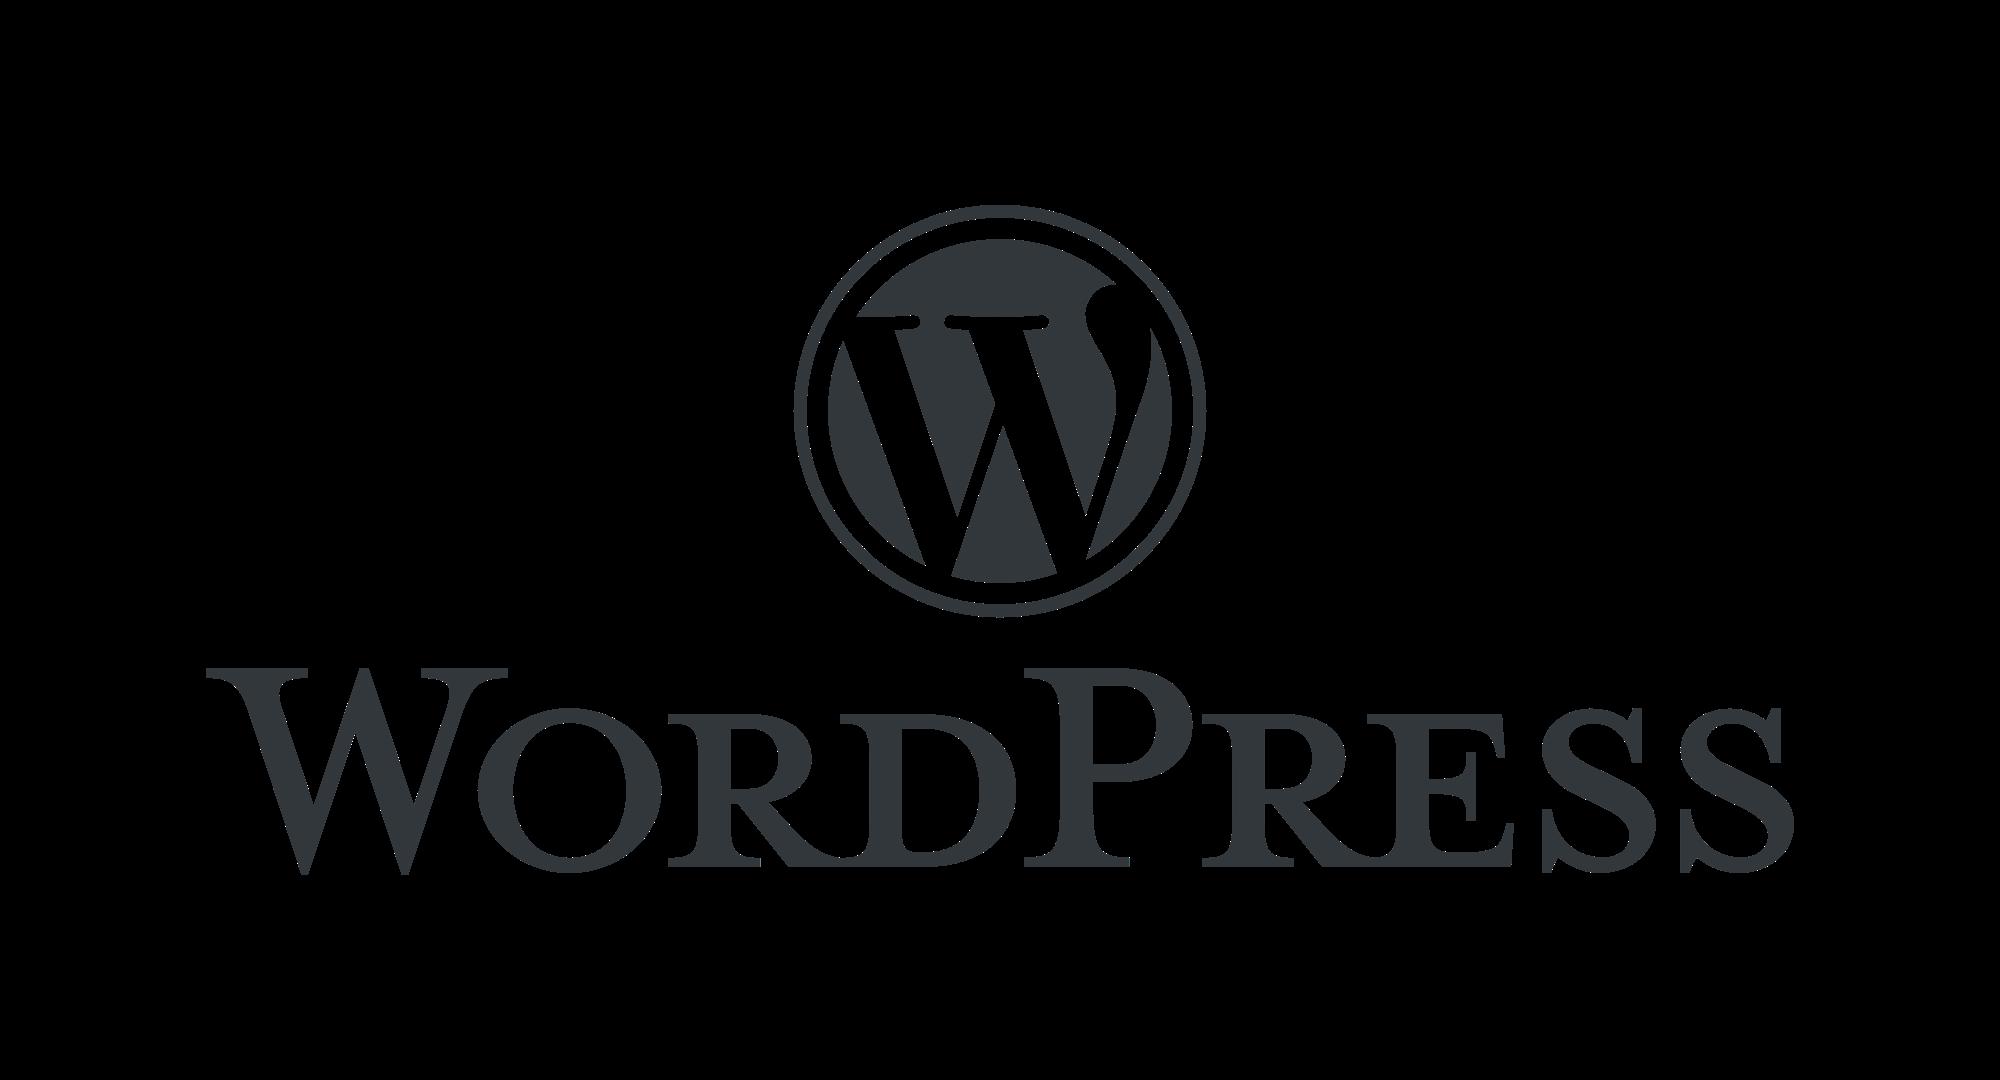 Pin By Putri Hapsari On Recursos Web 2 0 Wordpress Wordpress Logo Wordpress Seo